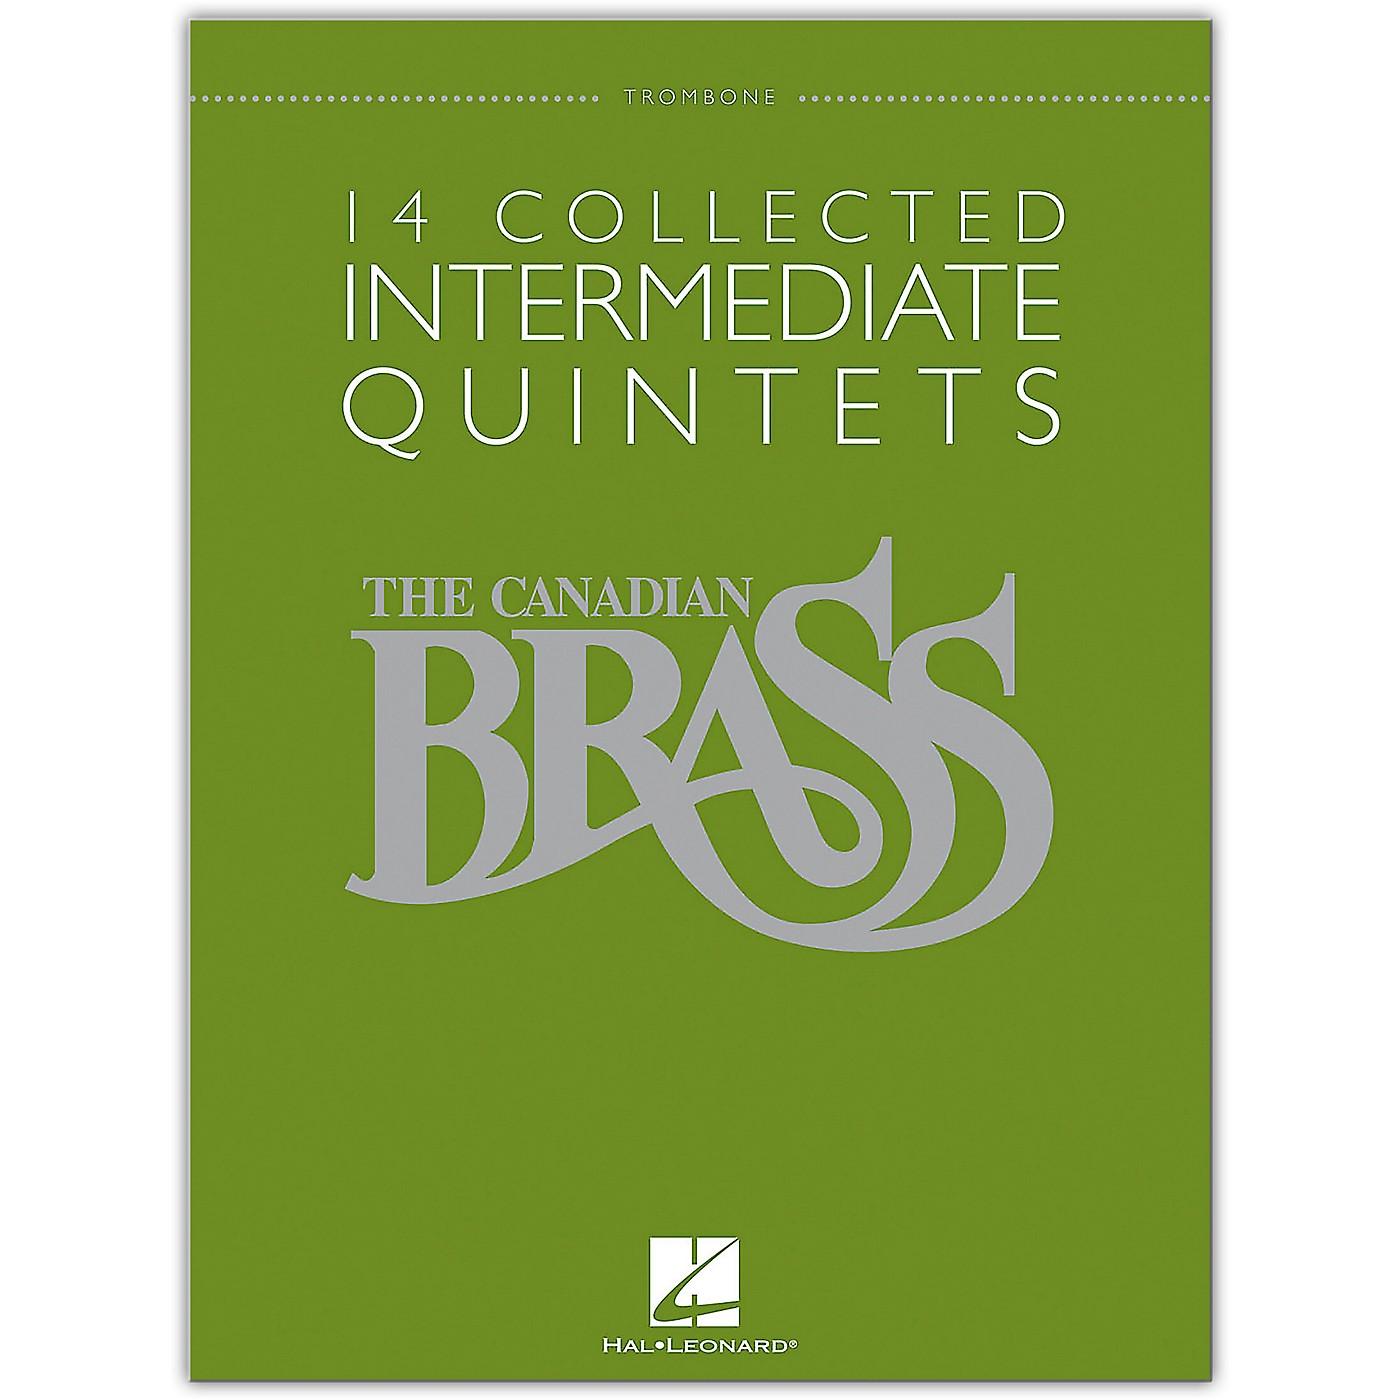 Hal Leonard The Canadian Brass: 14 Collected Intermediate Quintets - Trombone - Brass Quintet thumbnail